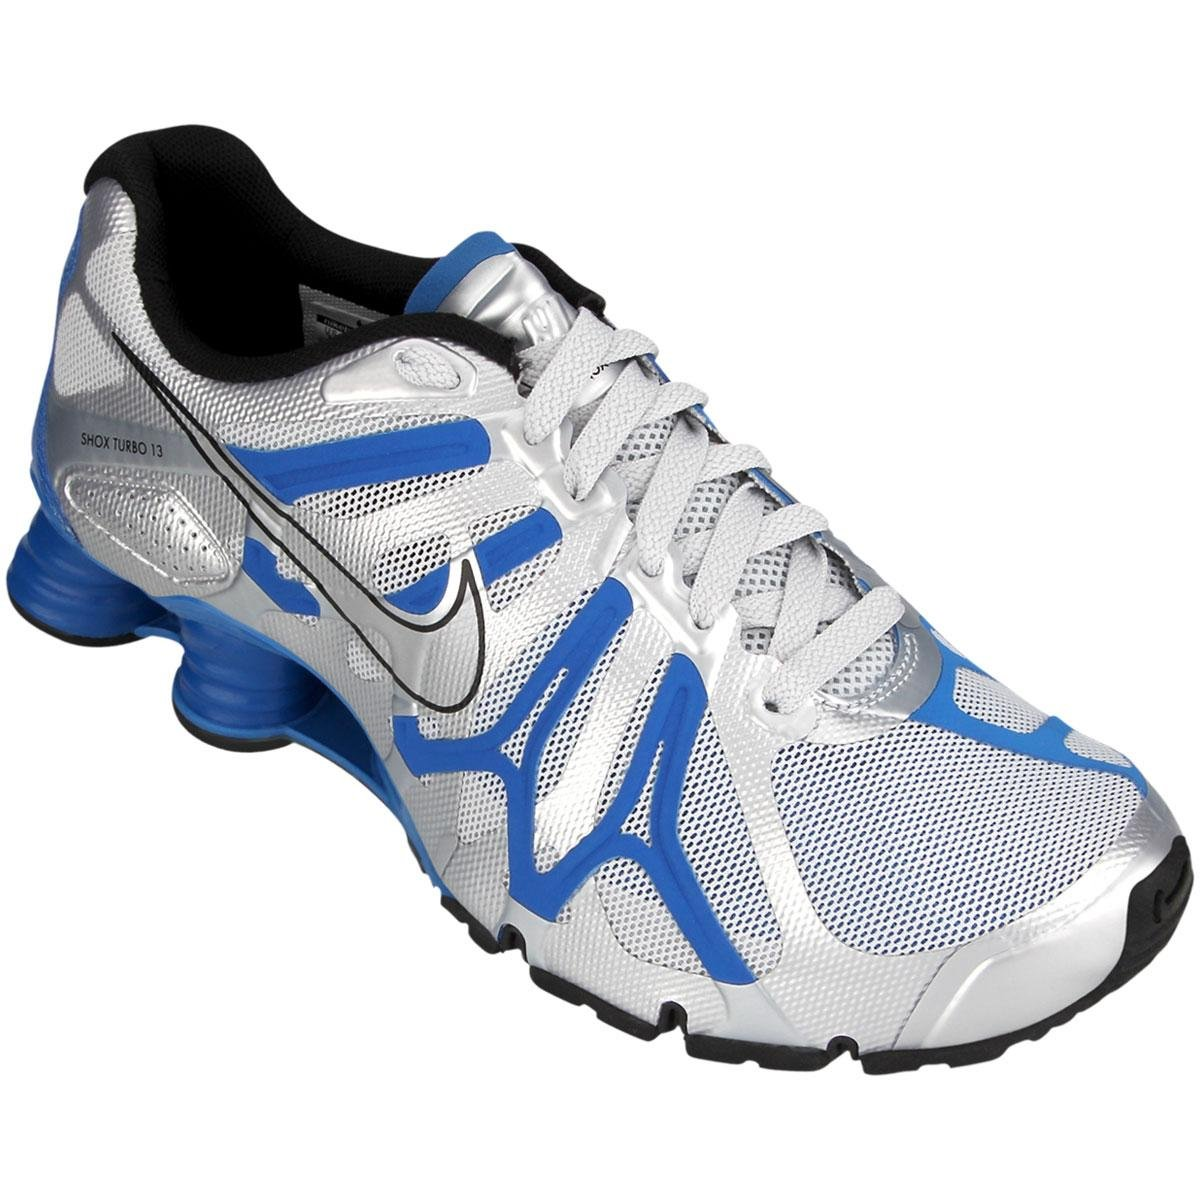 brand new 4bdbc b67d8 Tênis Nike Shox Turbo+ 13 - Prata e Azul ...